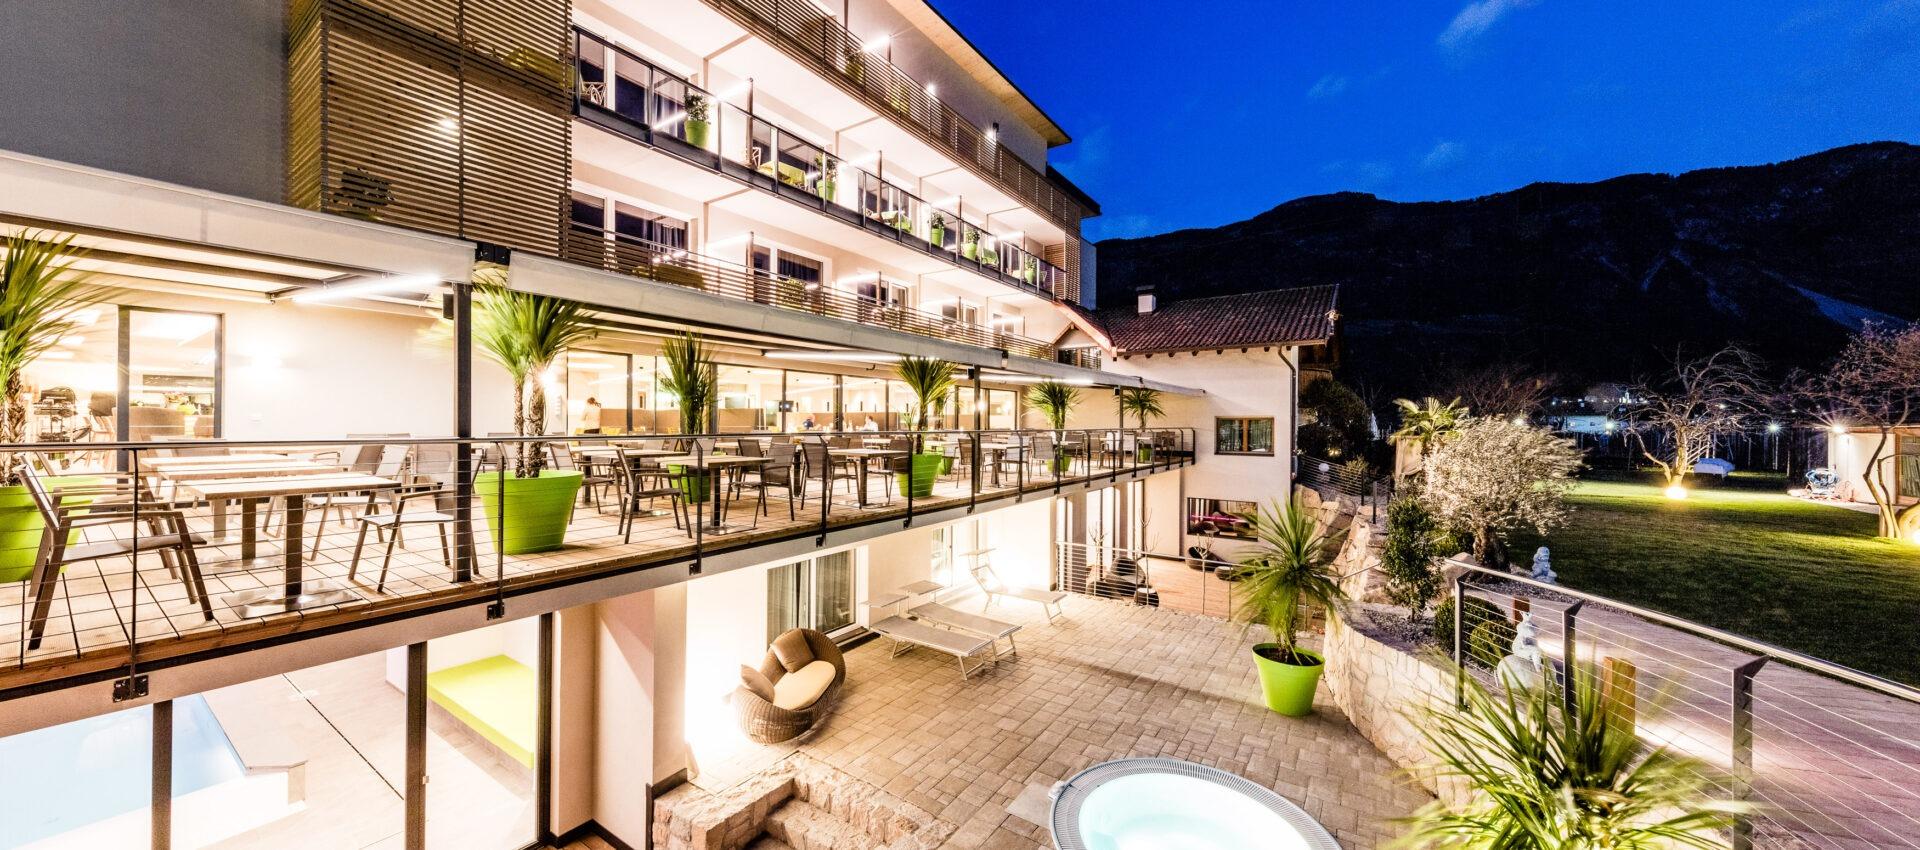 Hotel Lana  Sterne